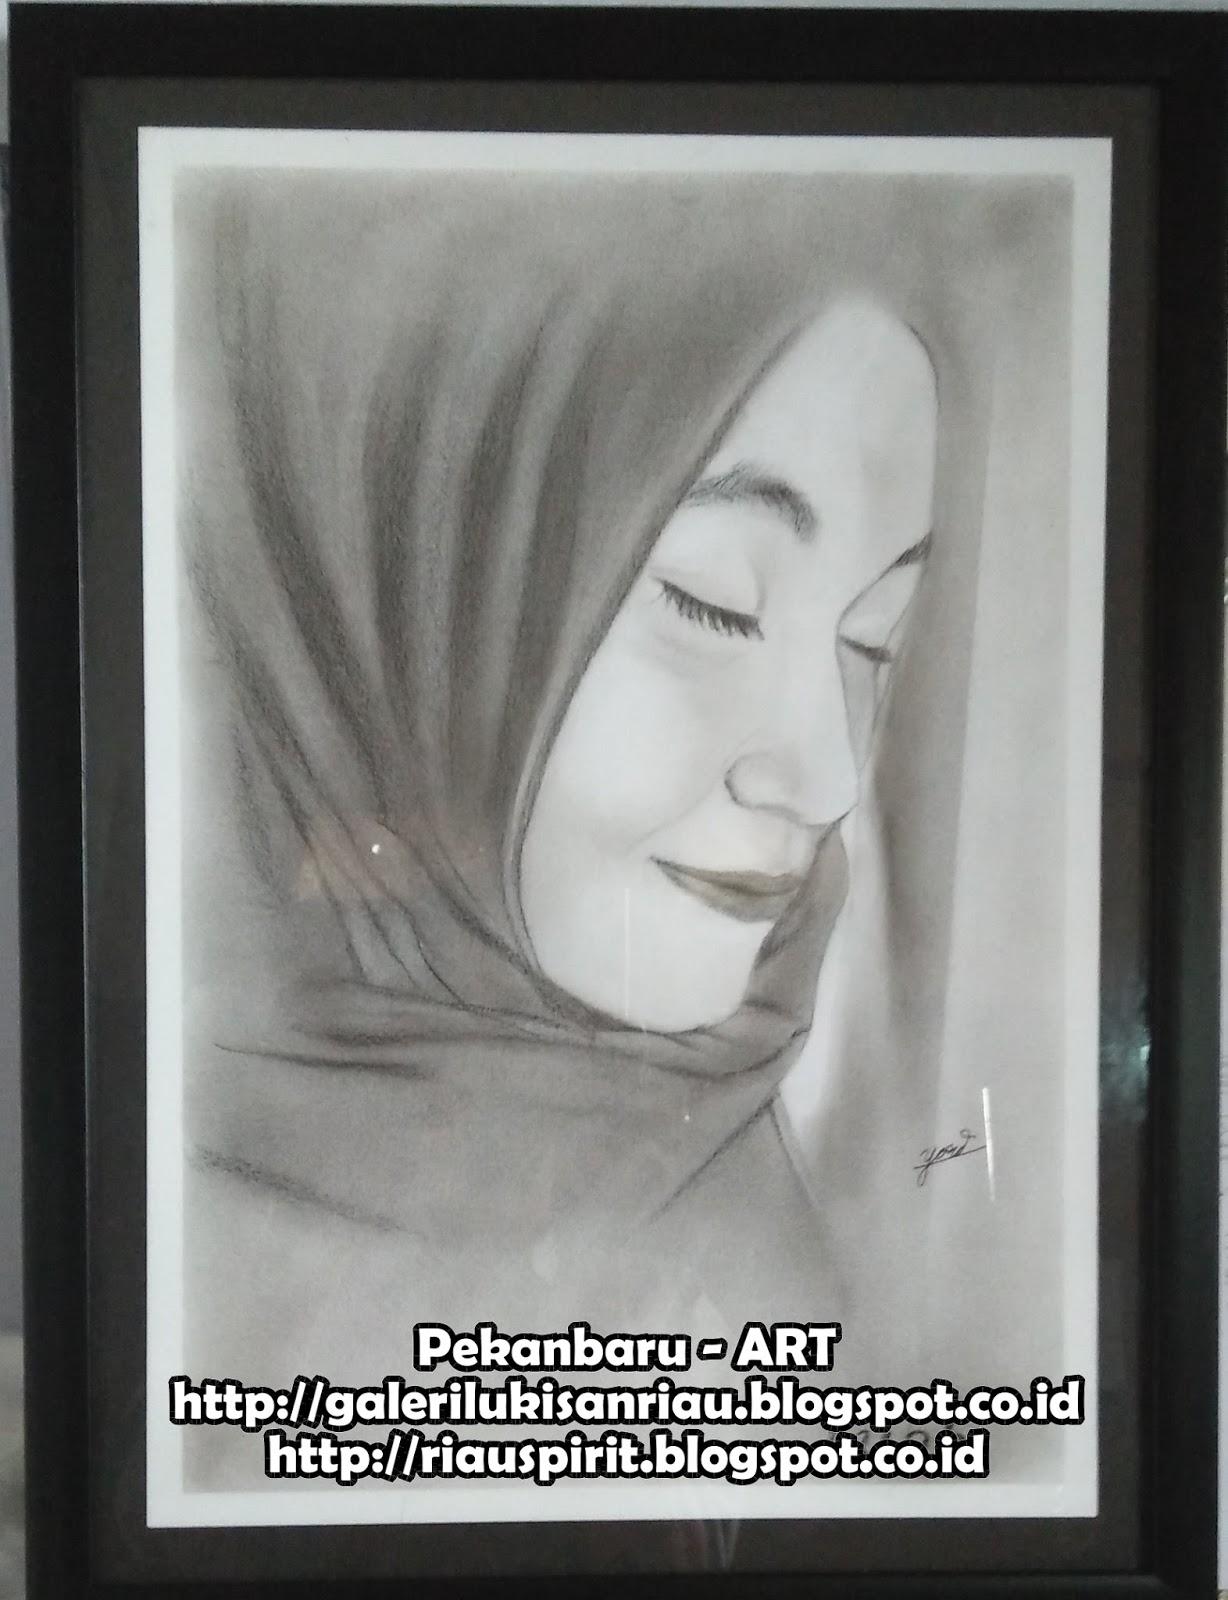 Gambar Sketsa Wajah Wanita Berhijab Belog Kite Kite Aje